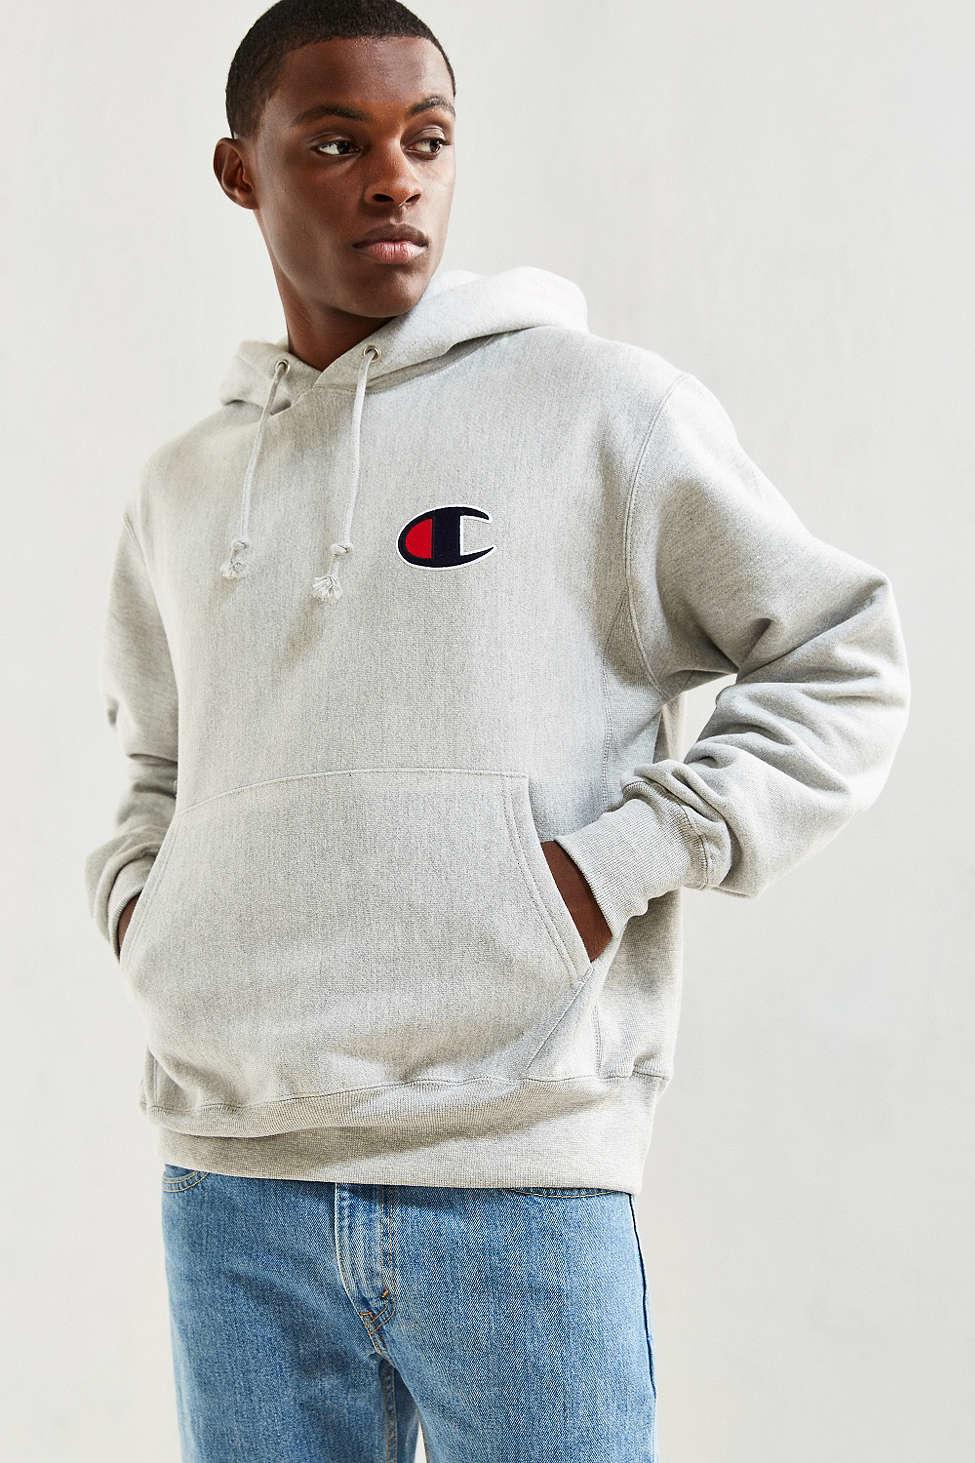 93866ec2 Champion Reverse Weave Large C Hoodie Sweatshirt in Gray for Men - Lyst